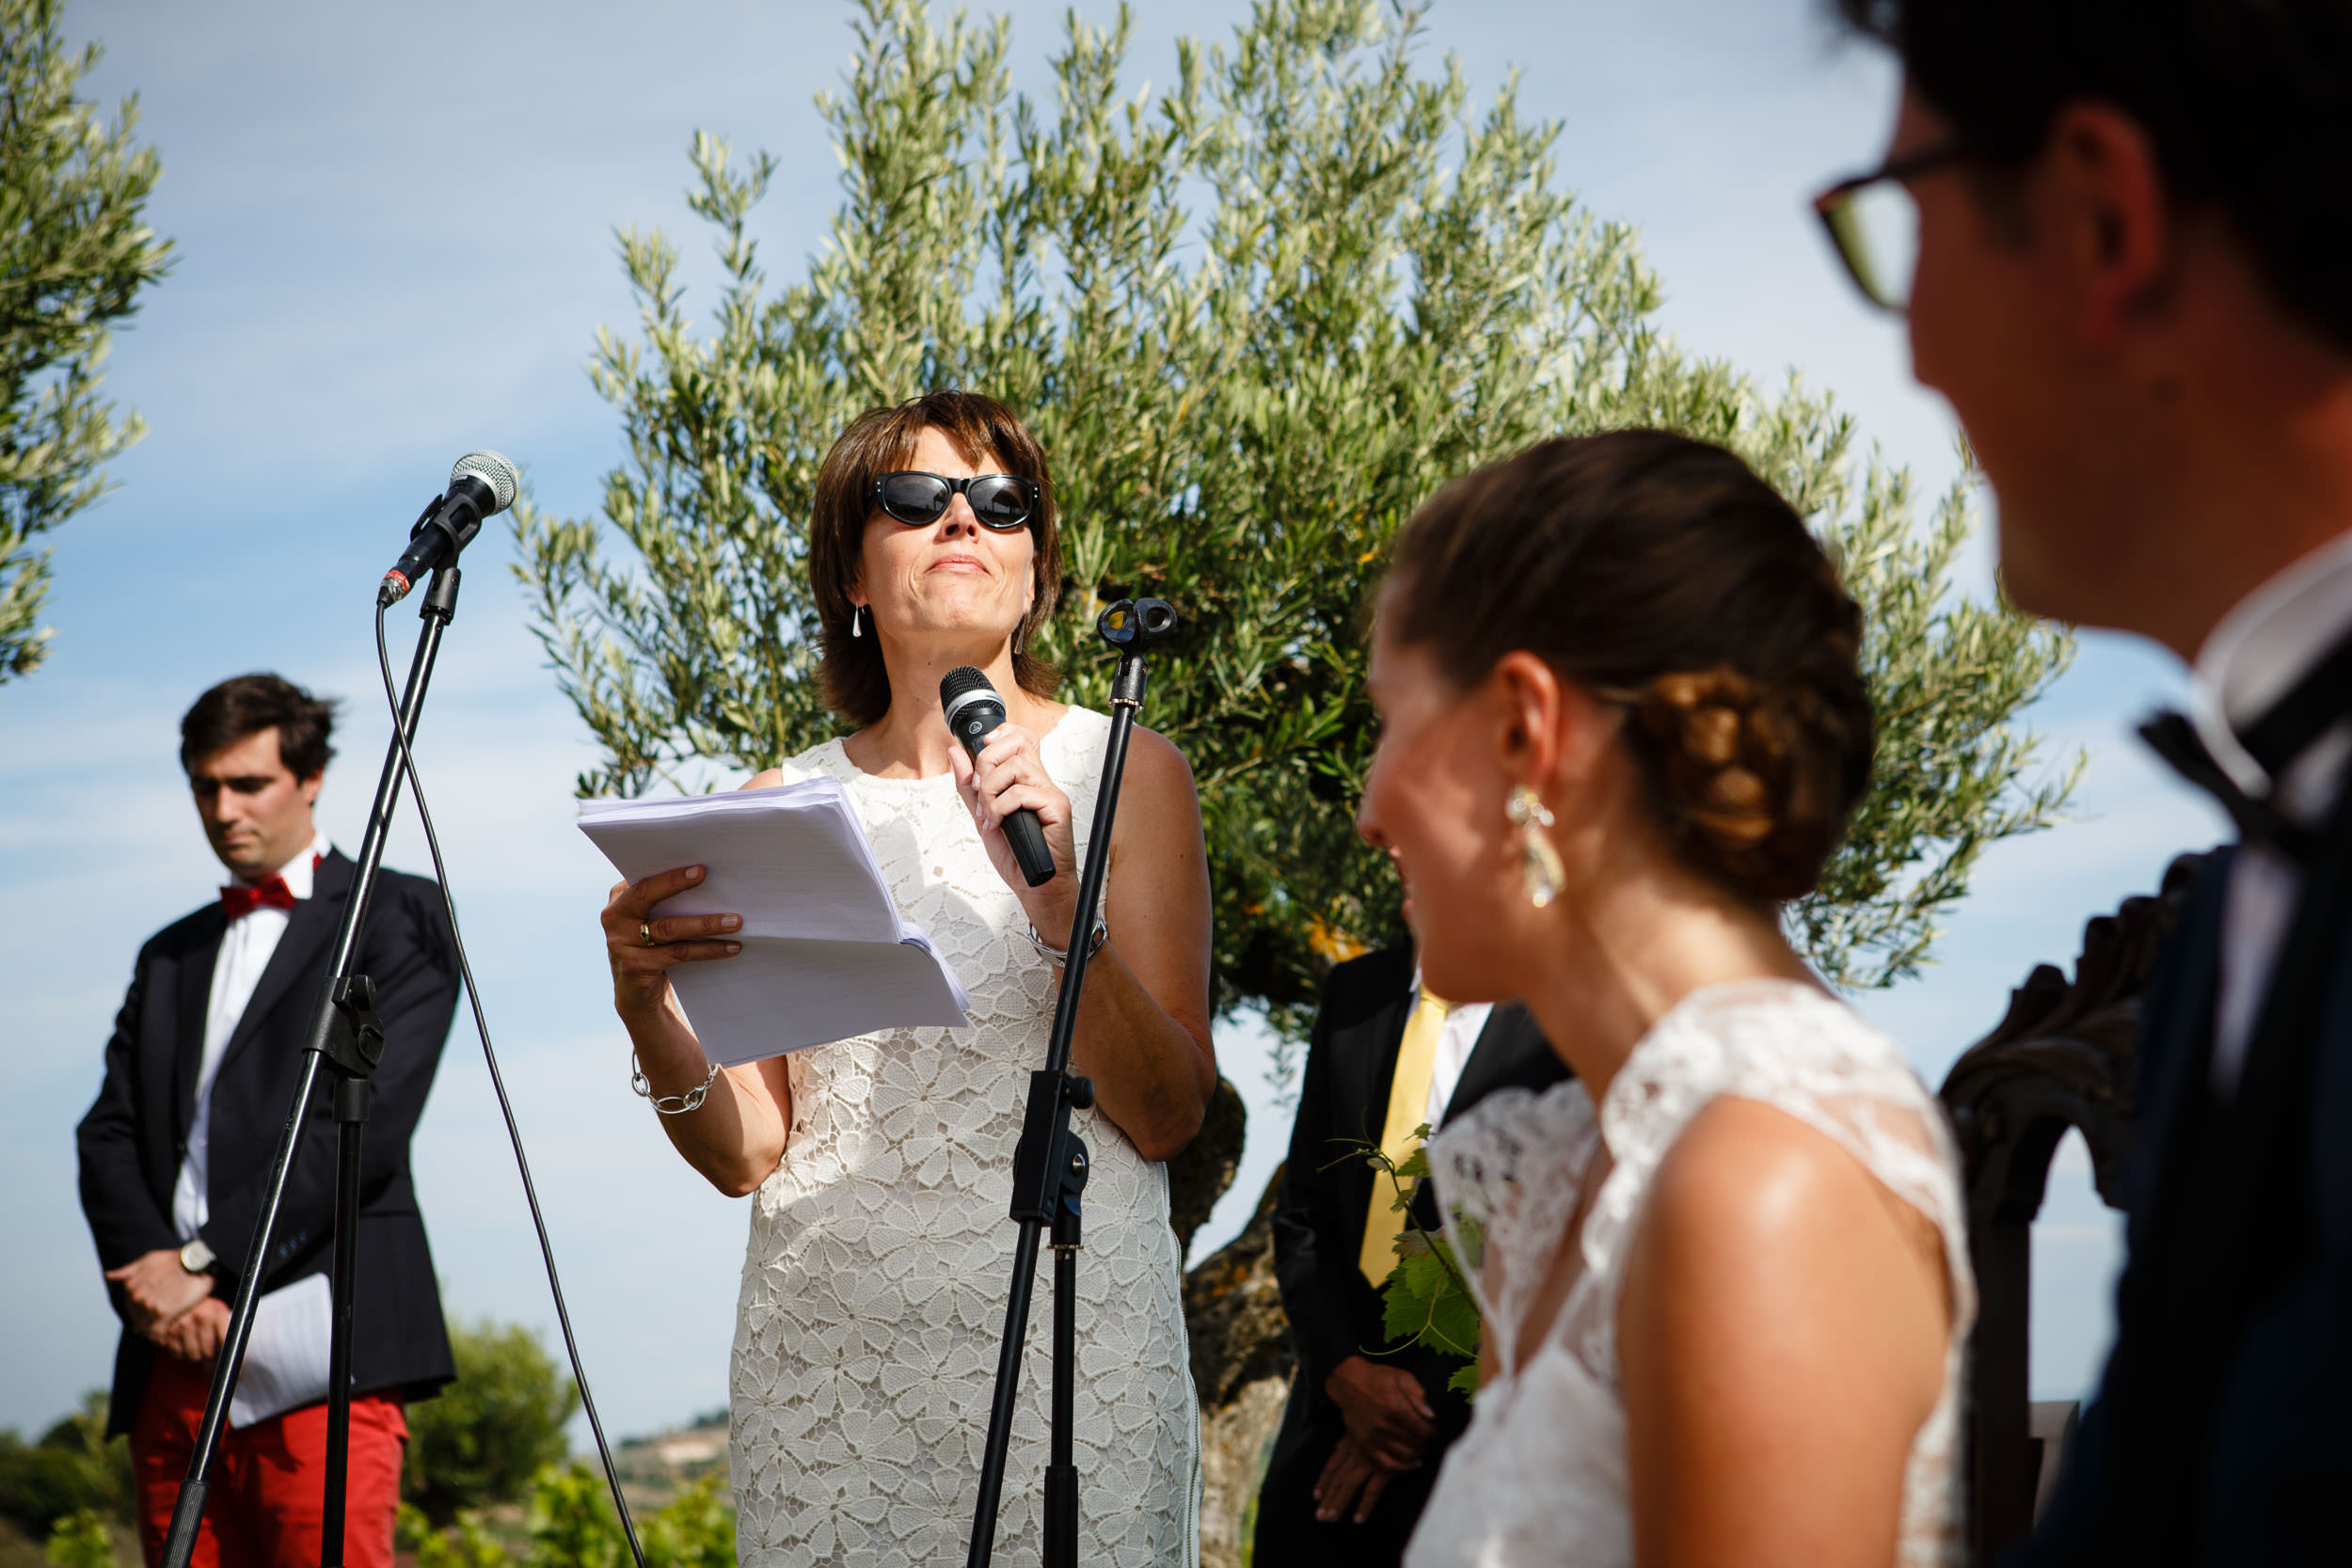 13/7/14 Charlotte & Grégoire's wedding, Hotel Eguren Ugarte, Laguardia, Alava, Basque Country, Spain. Photo by James Sturcke | www.sturcke.org